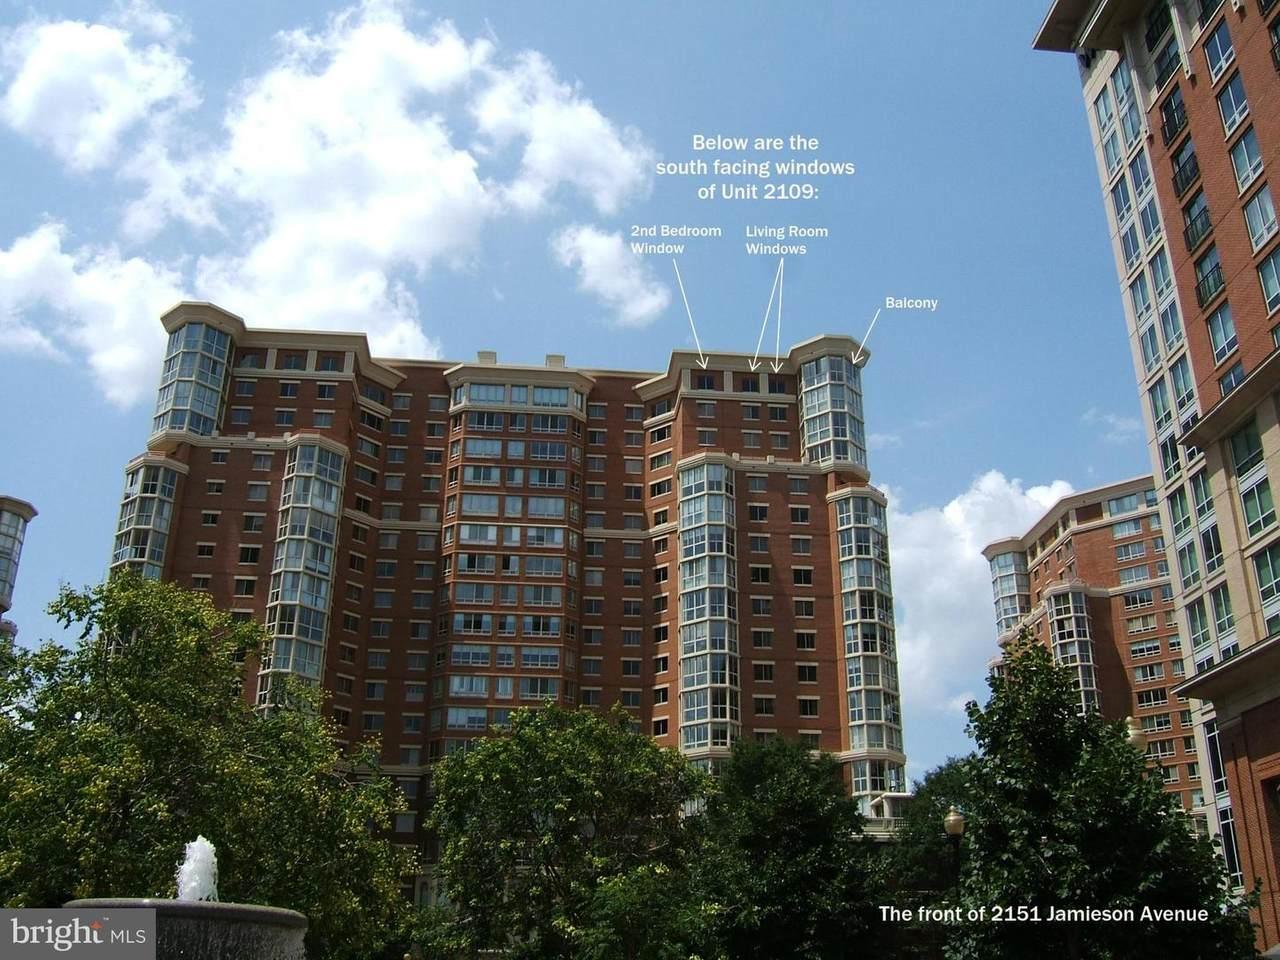 2151 Jamieson Avenue - Photo 1